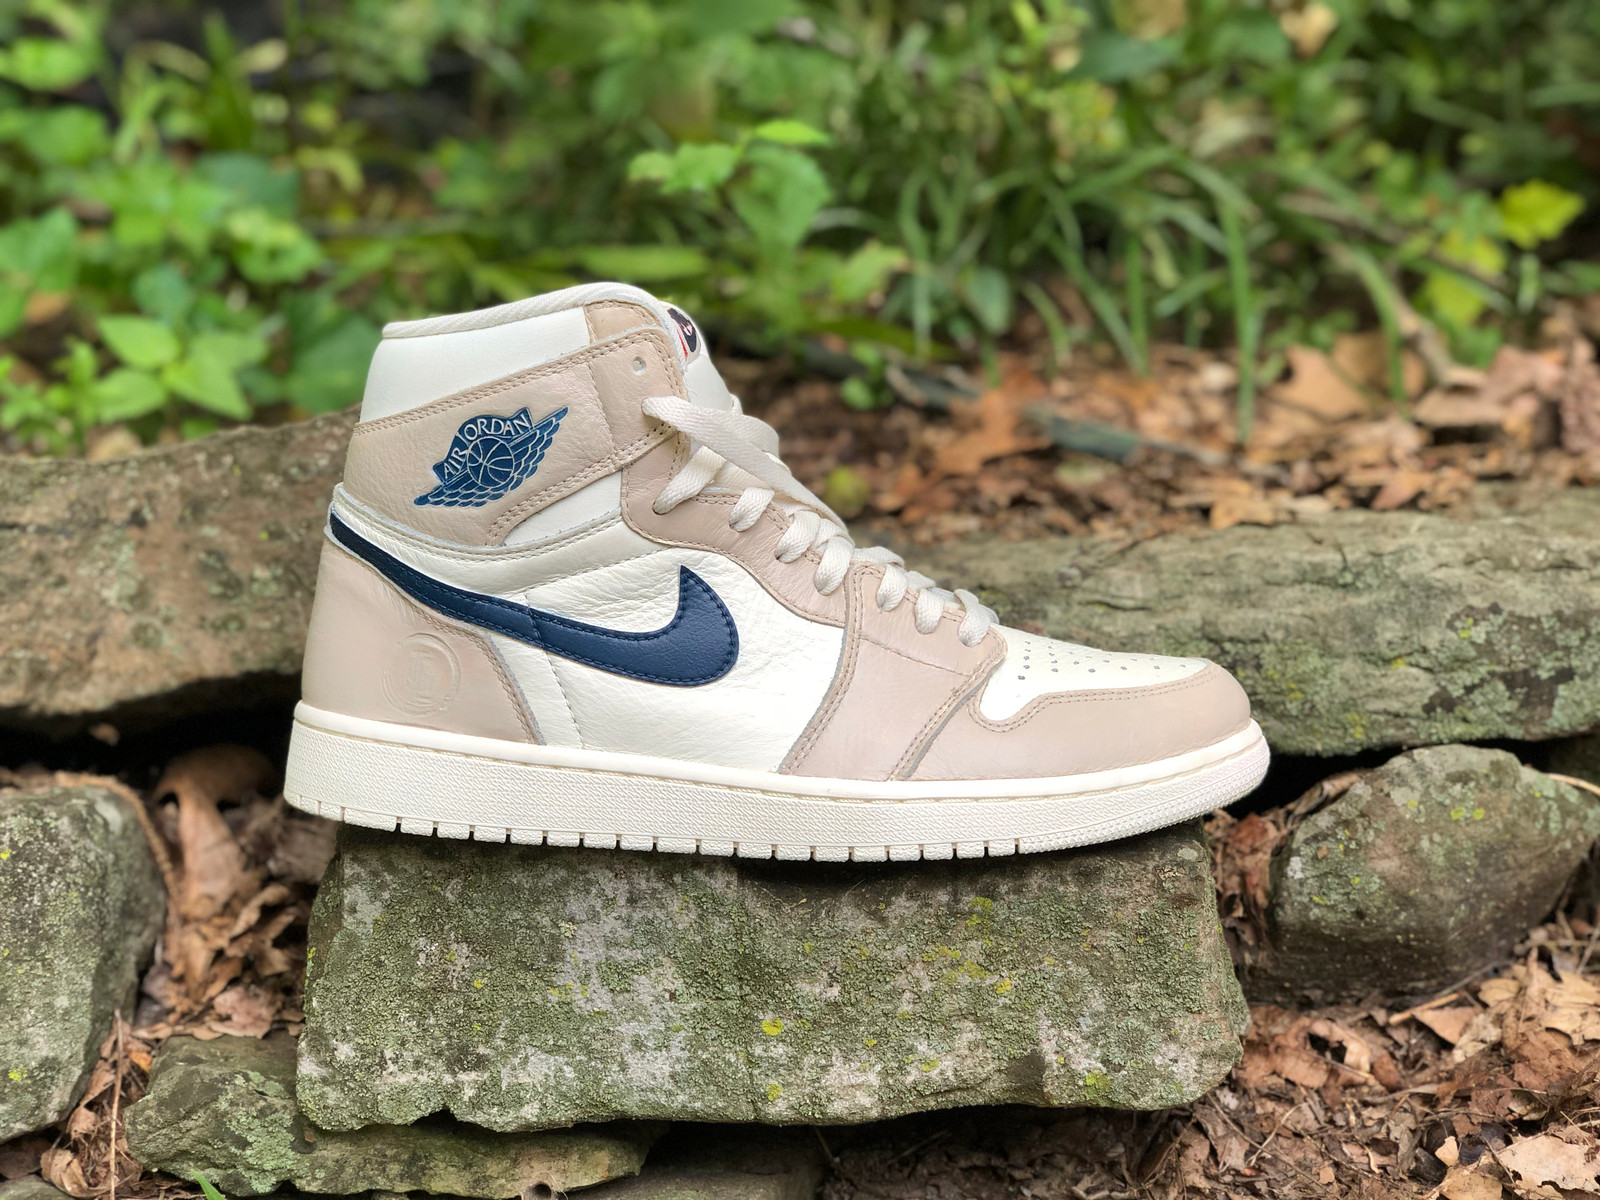 new products d0206 b33c7 Kill Shot Nike Air Jordan 1 OG